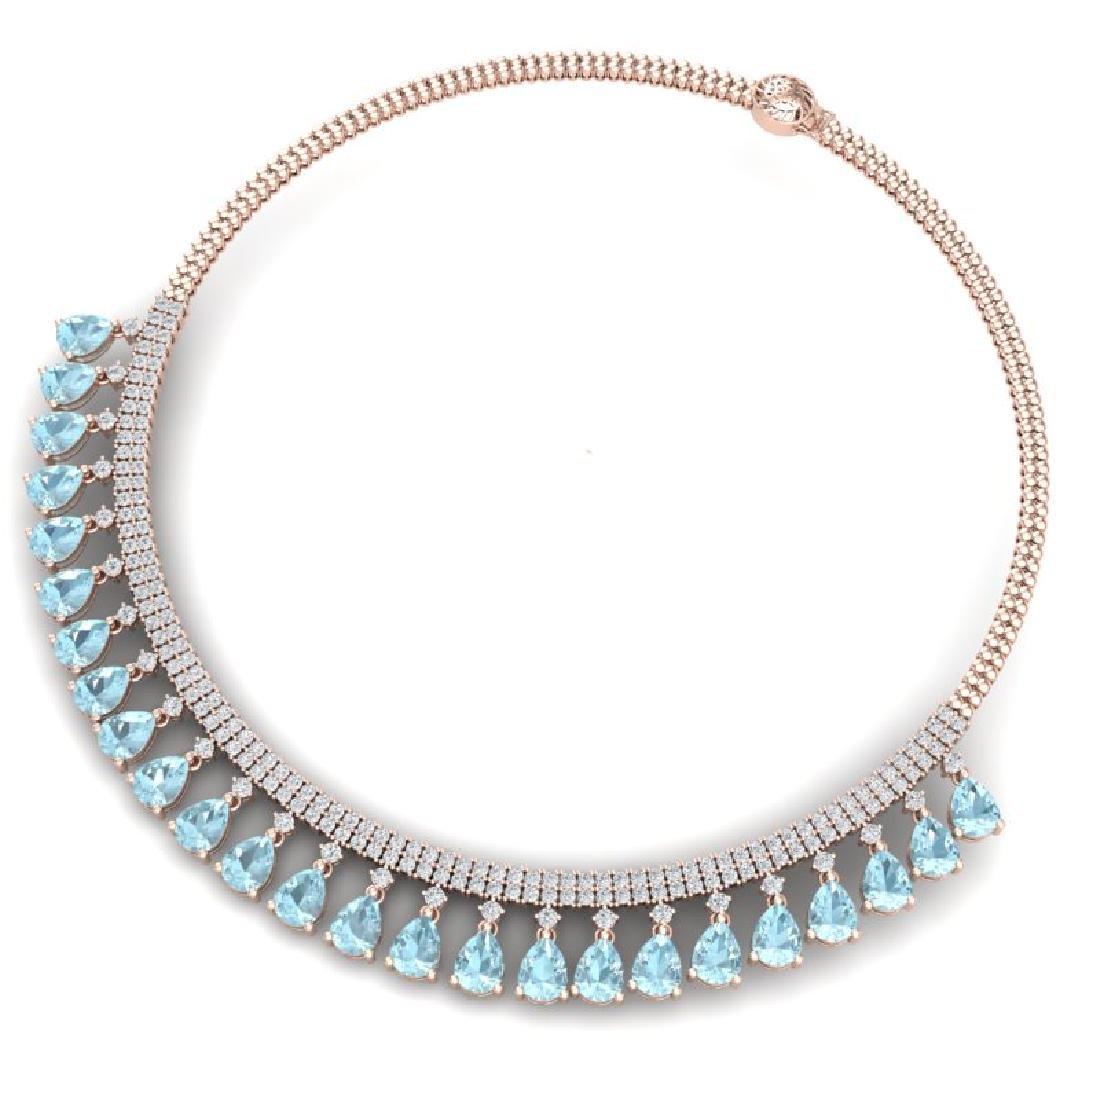 43.05 CTW Royalty Sky Topaz & VS Diamond Necklace 18K - 3